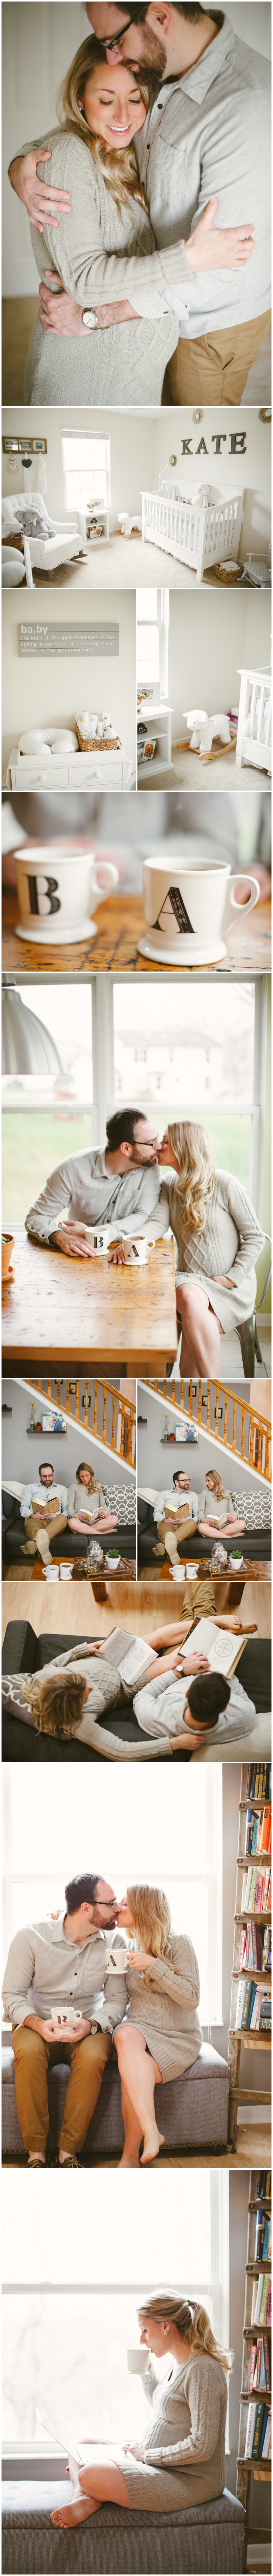 Blog Collage-KateMaternity3